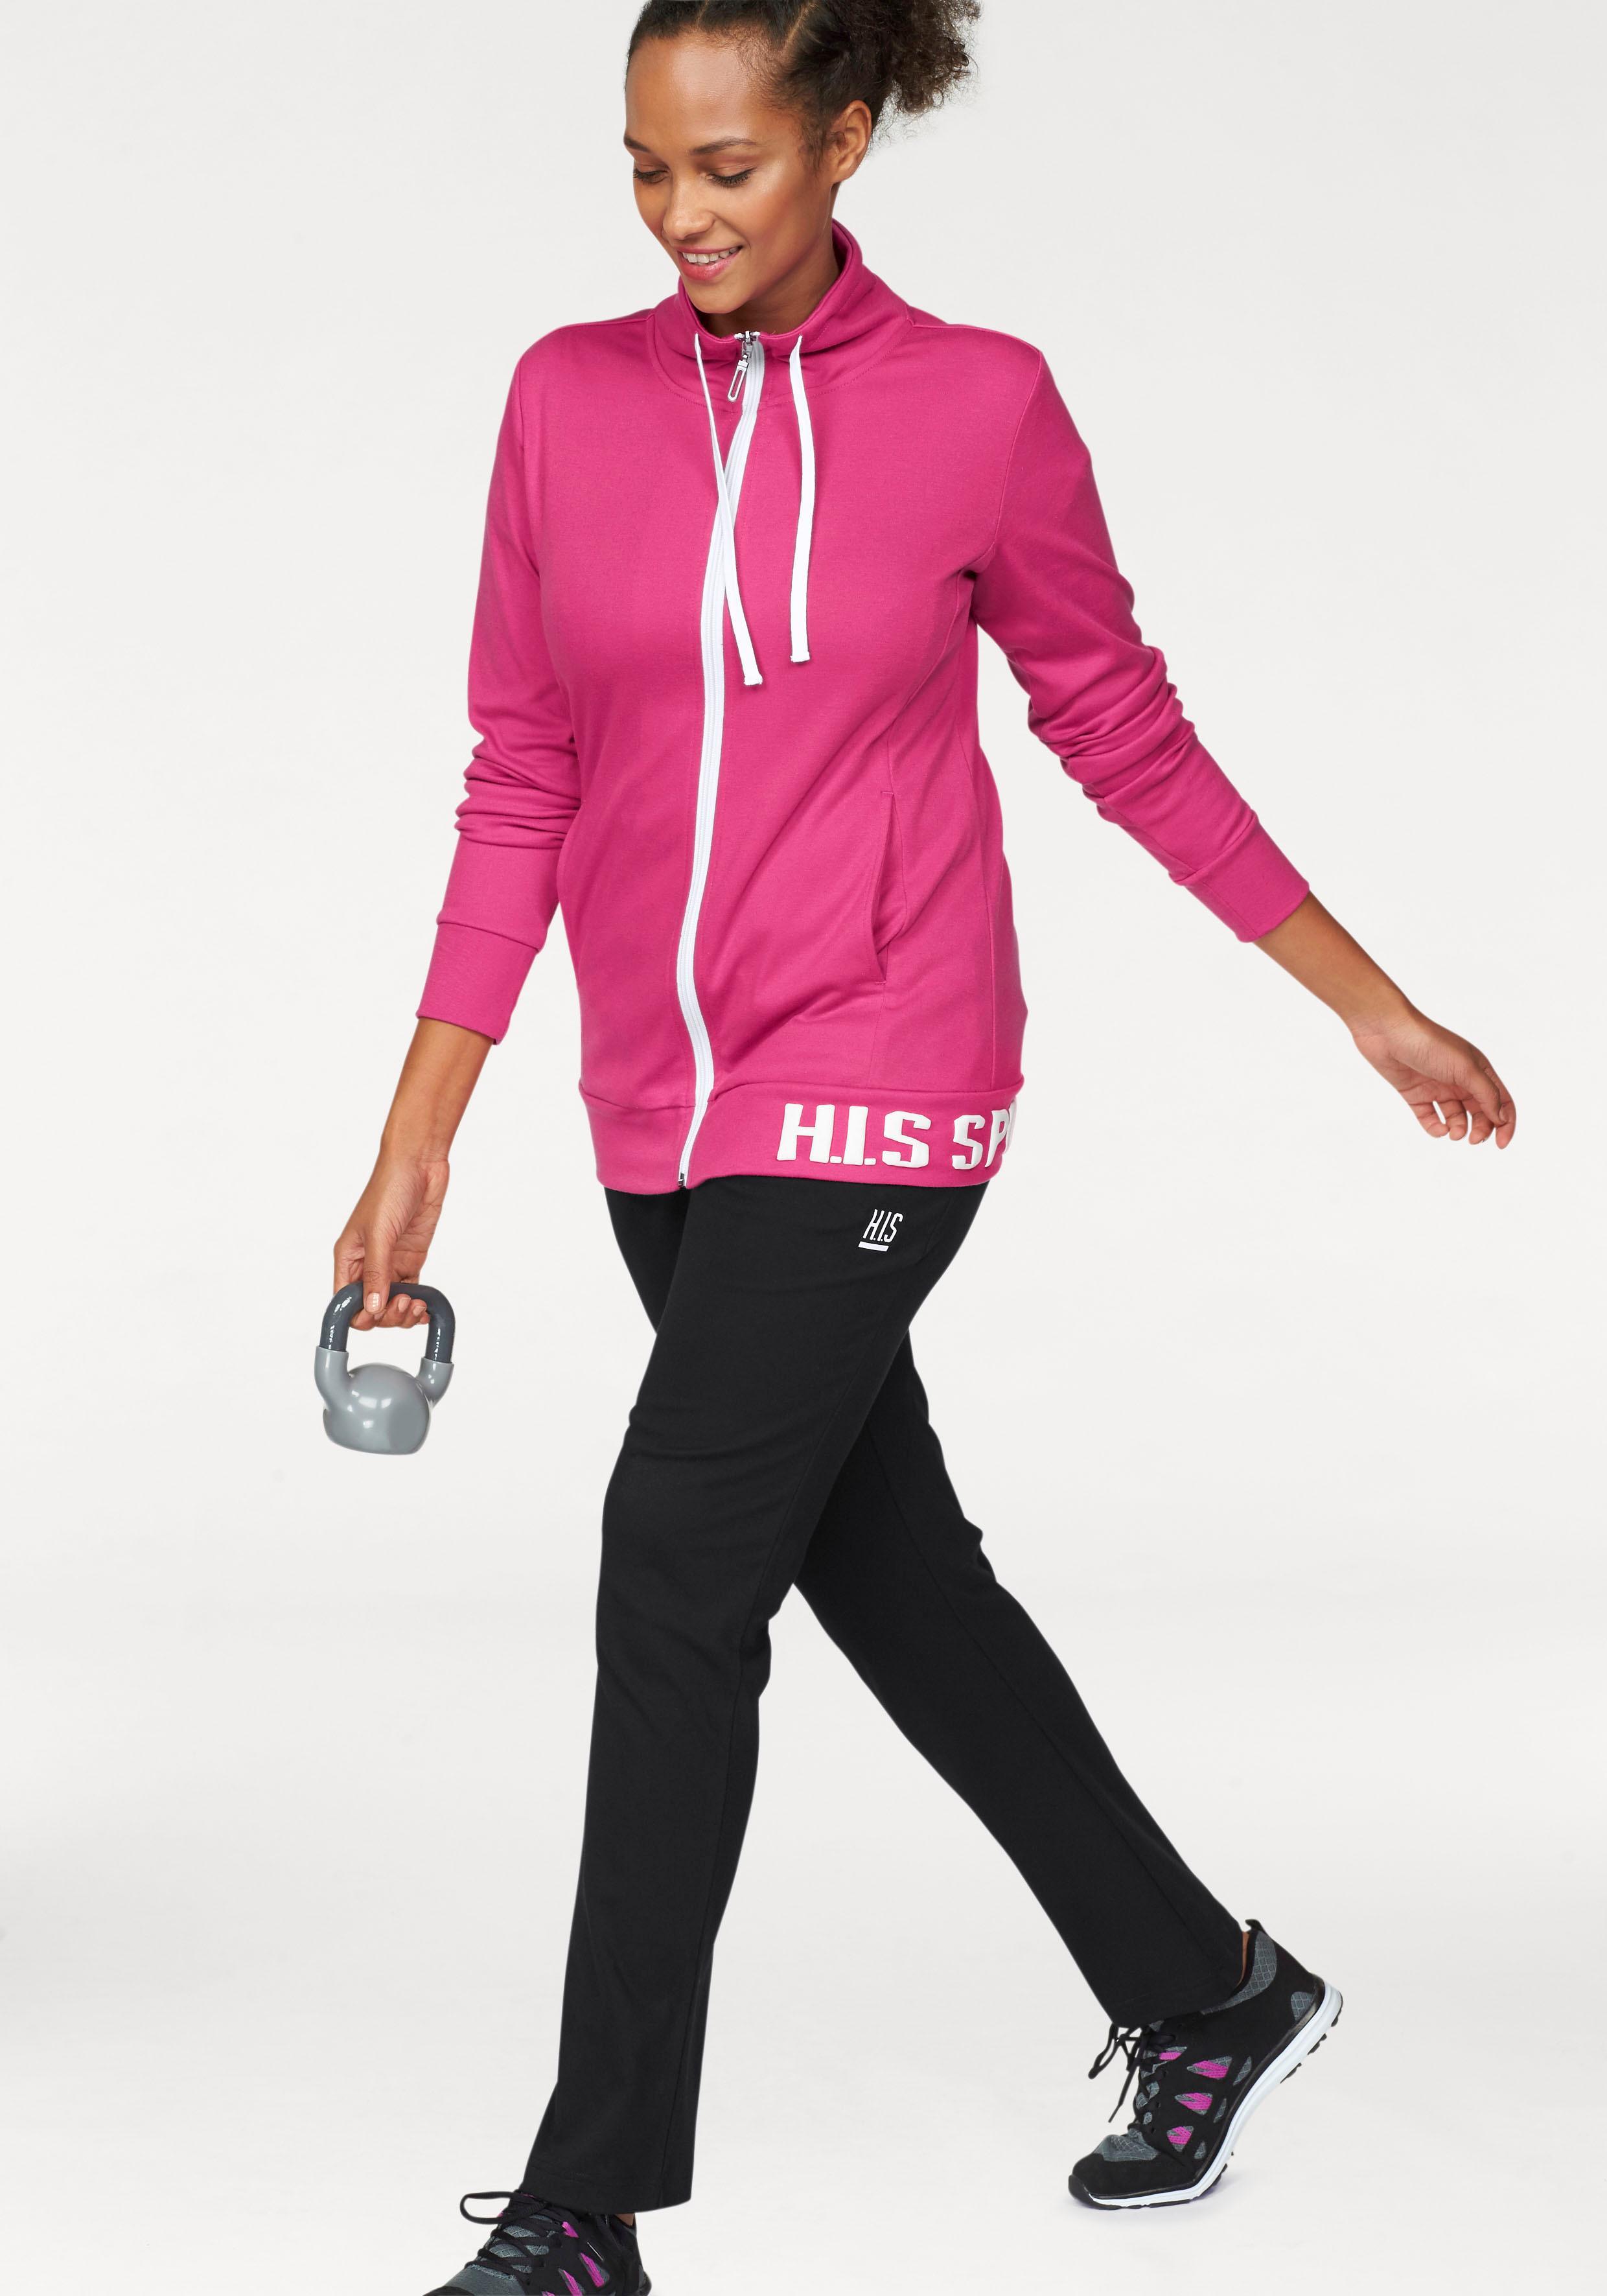 HIS Jogginganzug (Set 2 tlg) | Sportbekleidung > Sportanzüge > Jogginganzüge | H.I.S